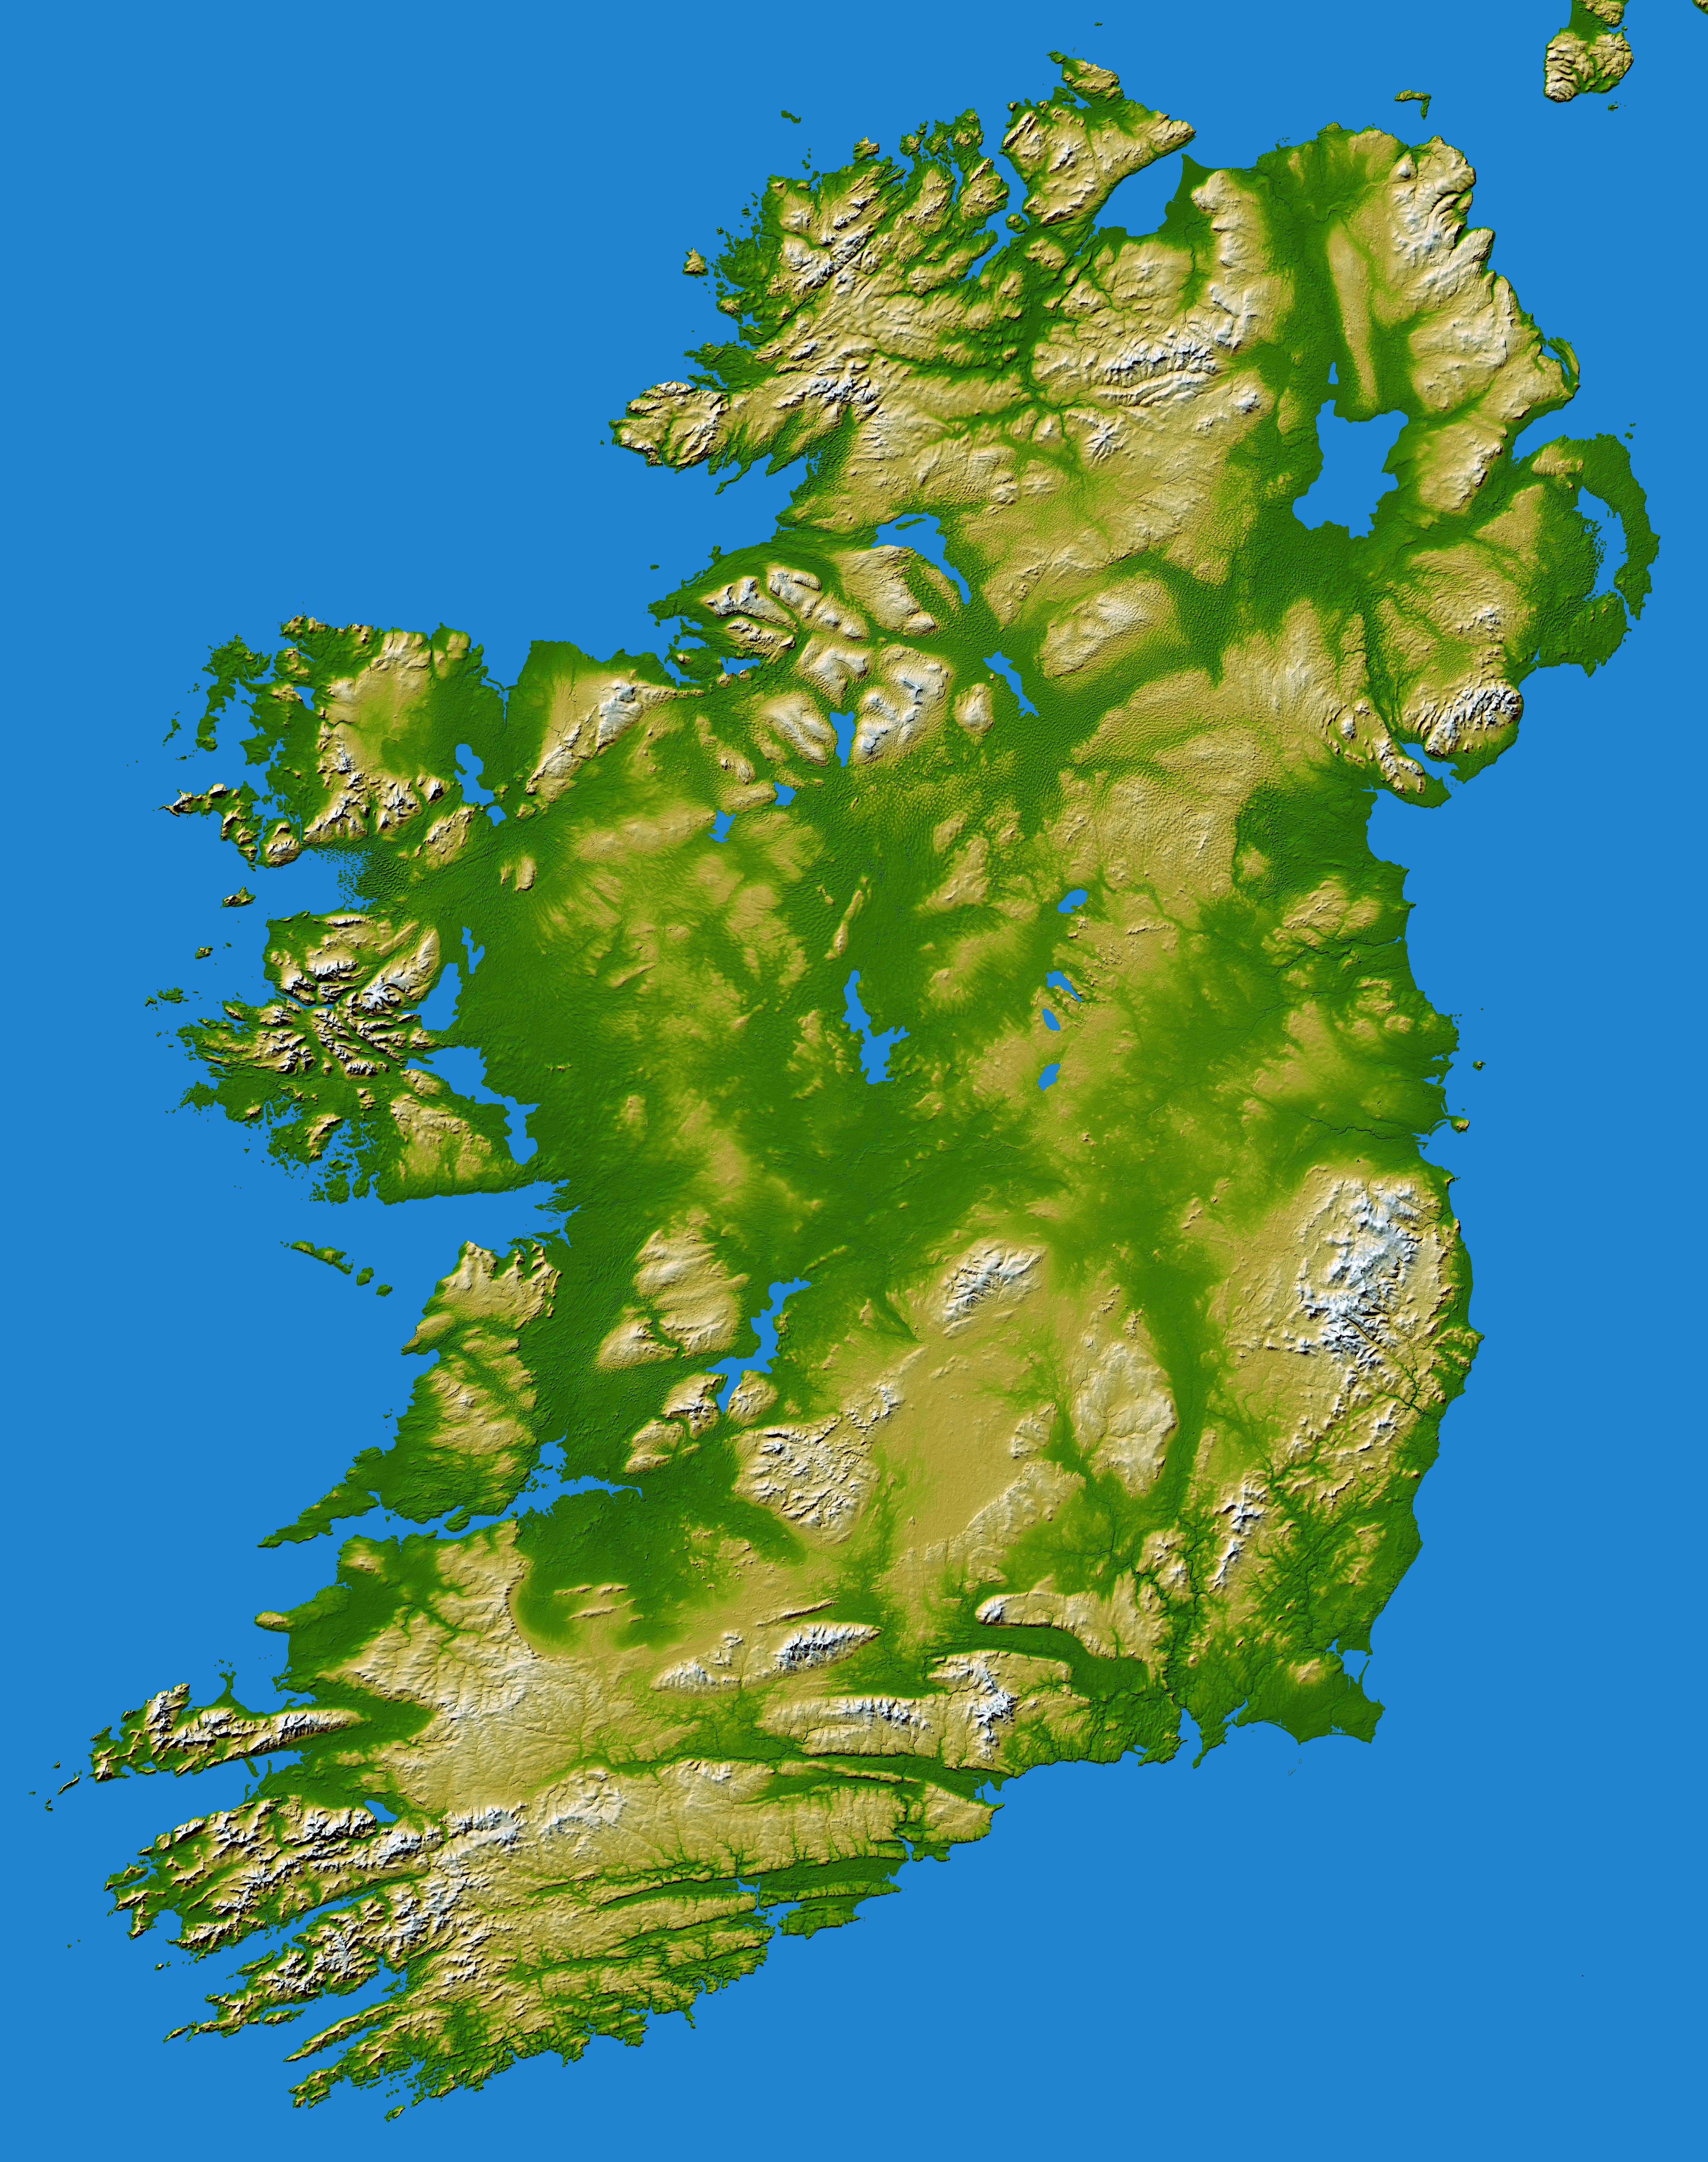 Mapa topograficzna Irlandii